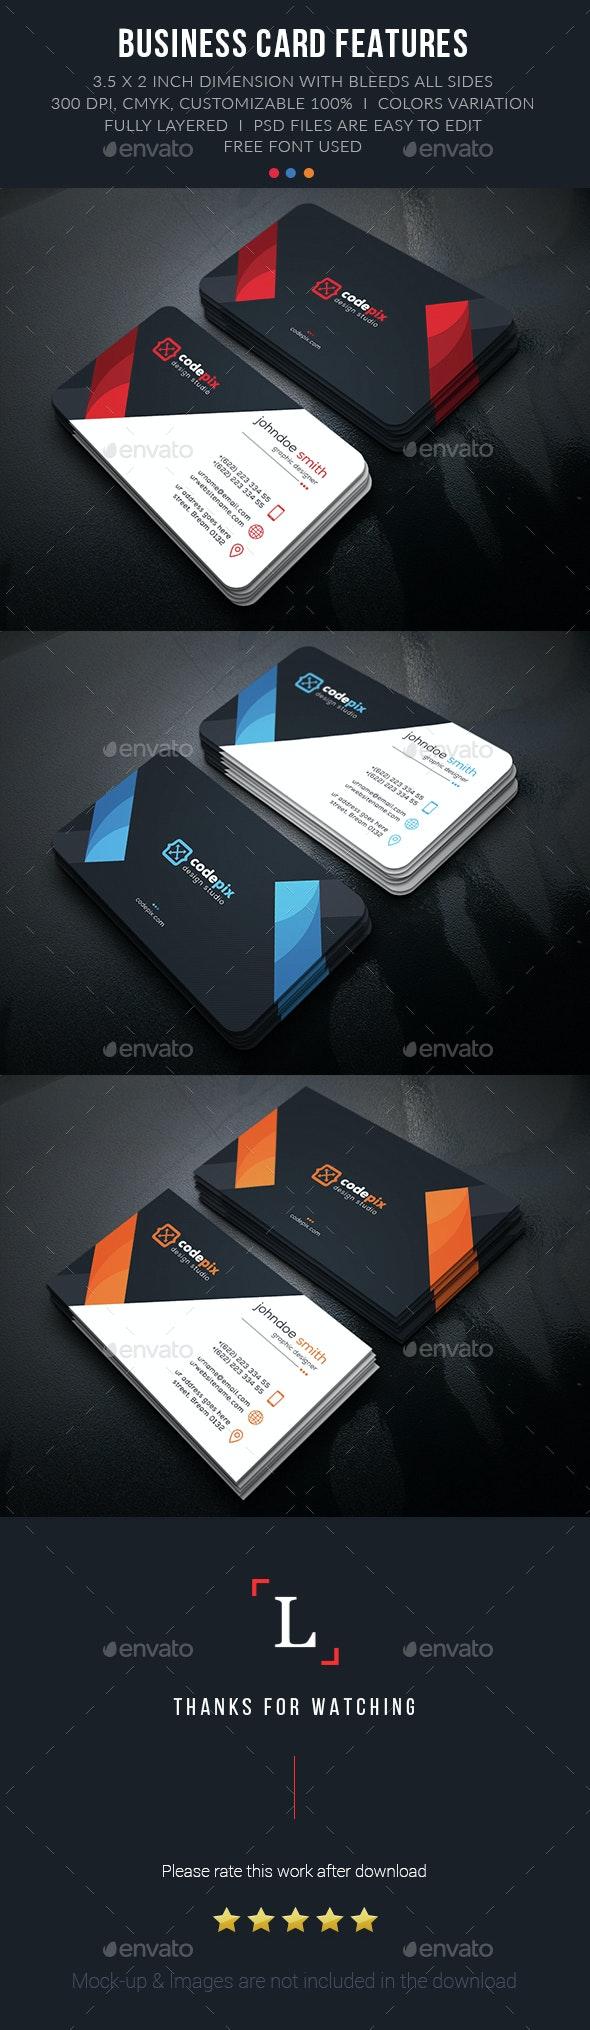 Design Creative Business Card - Business Cards Print Templates